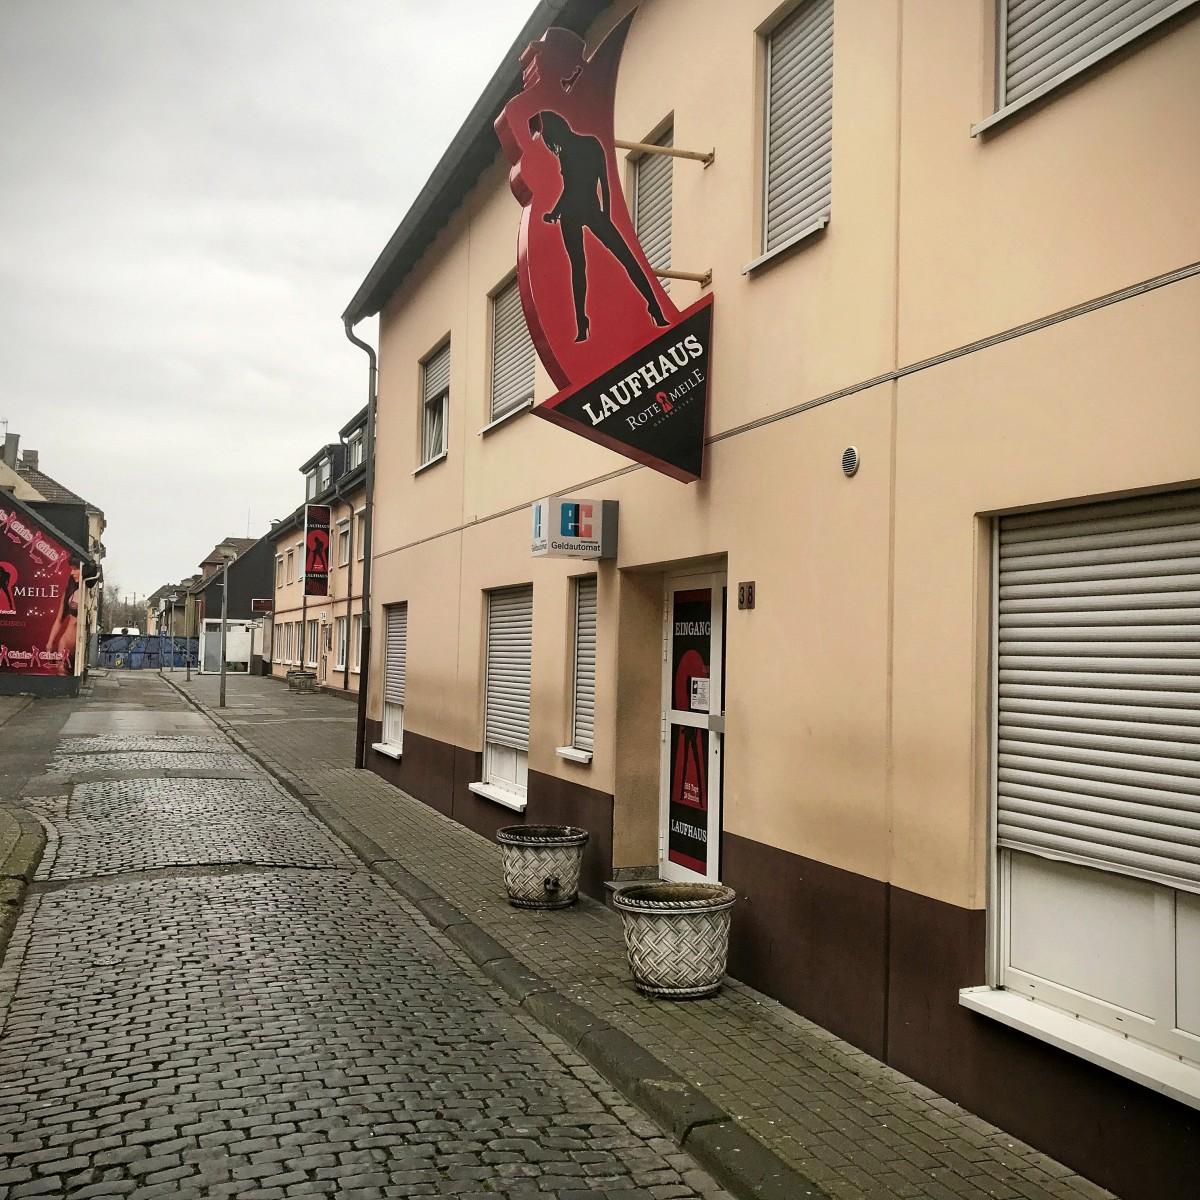 Flaßhofstraße oberhausen